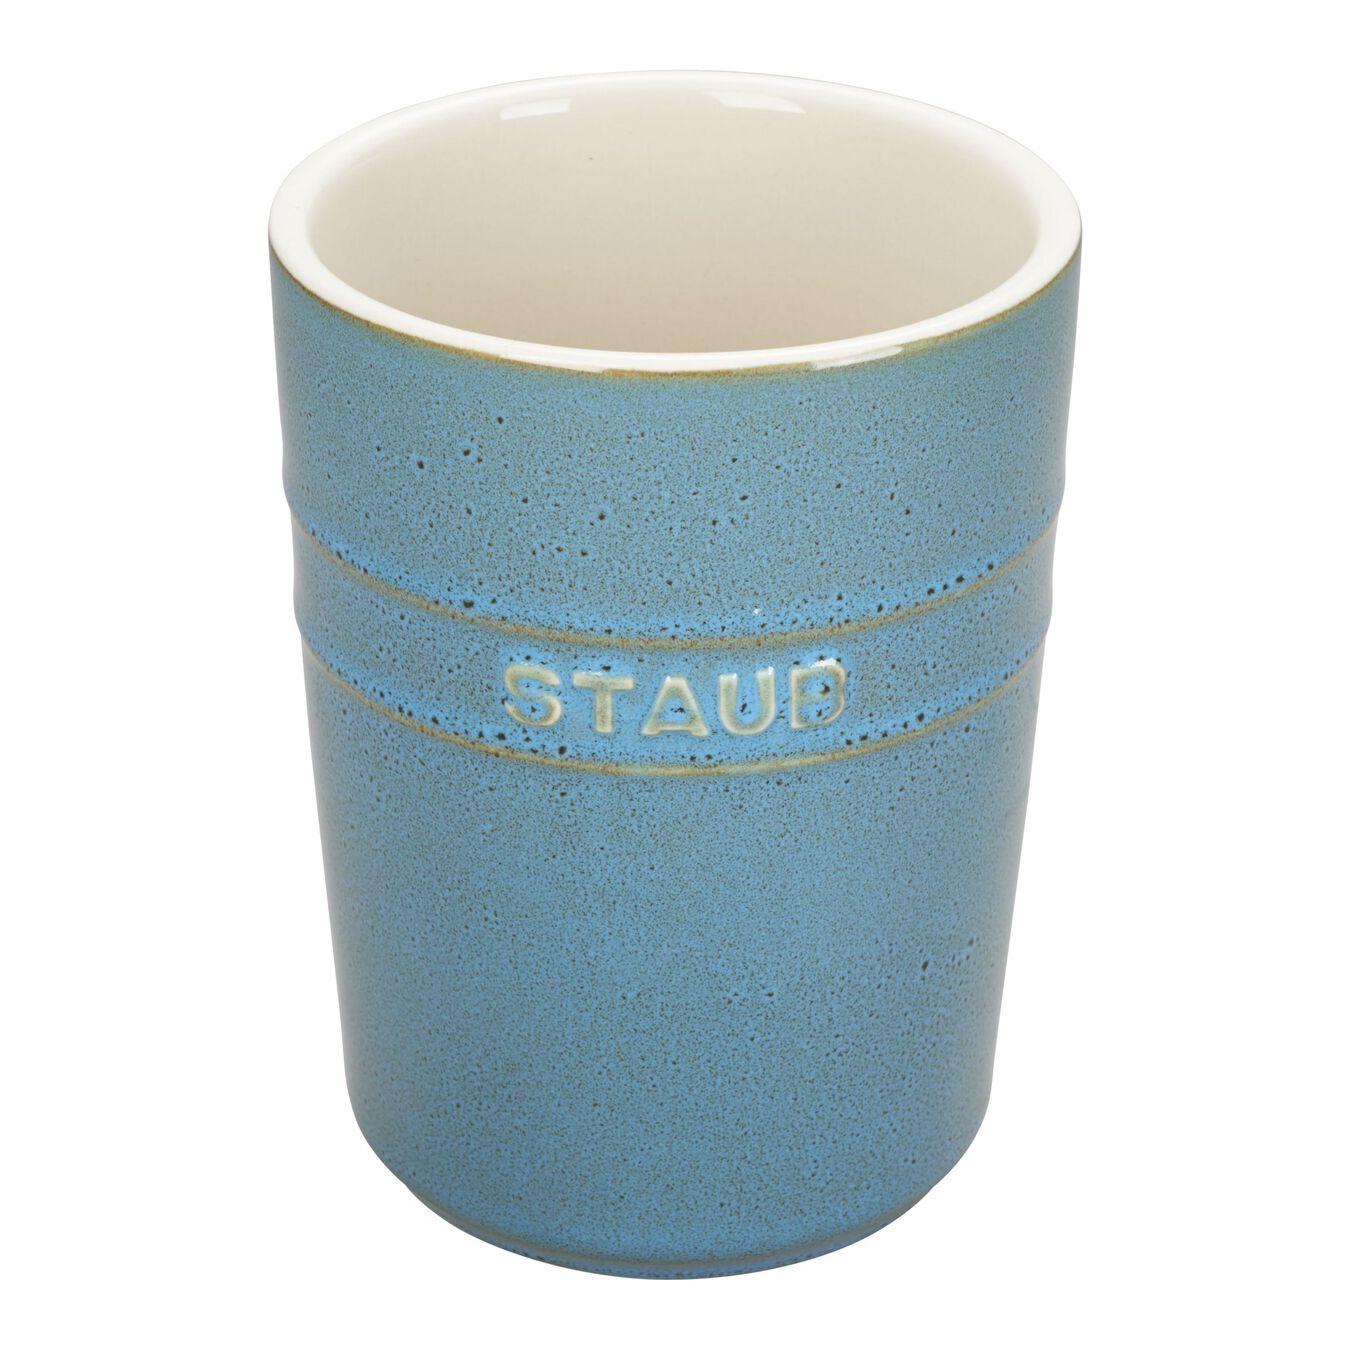 Utensil holder, rustic turquoise,,large 1